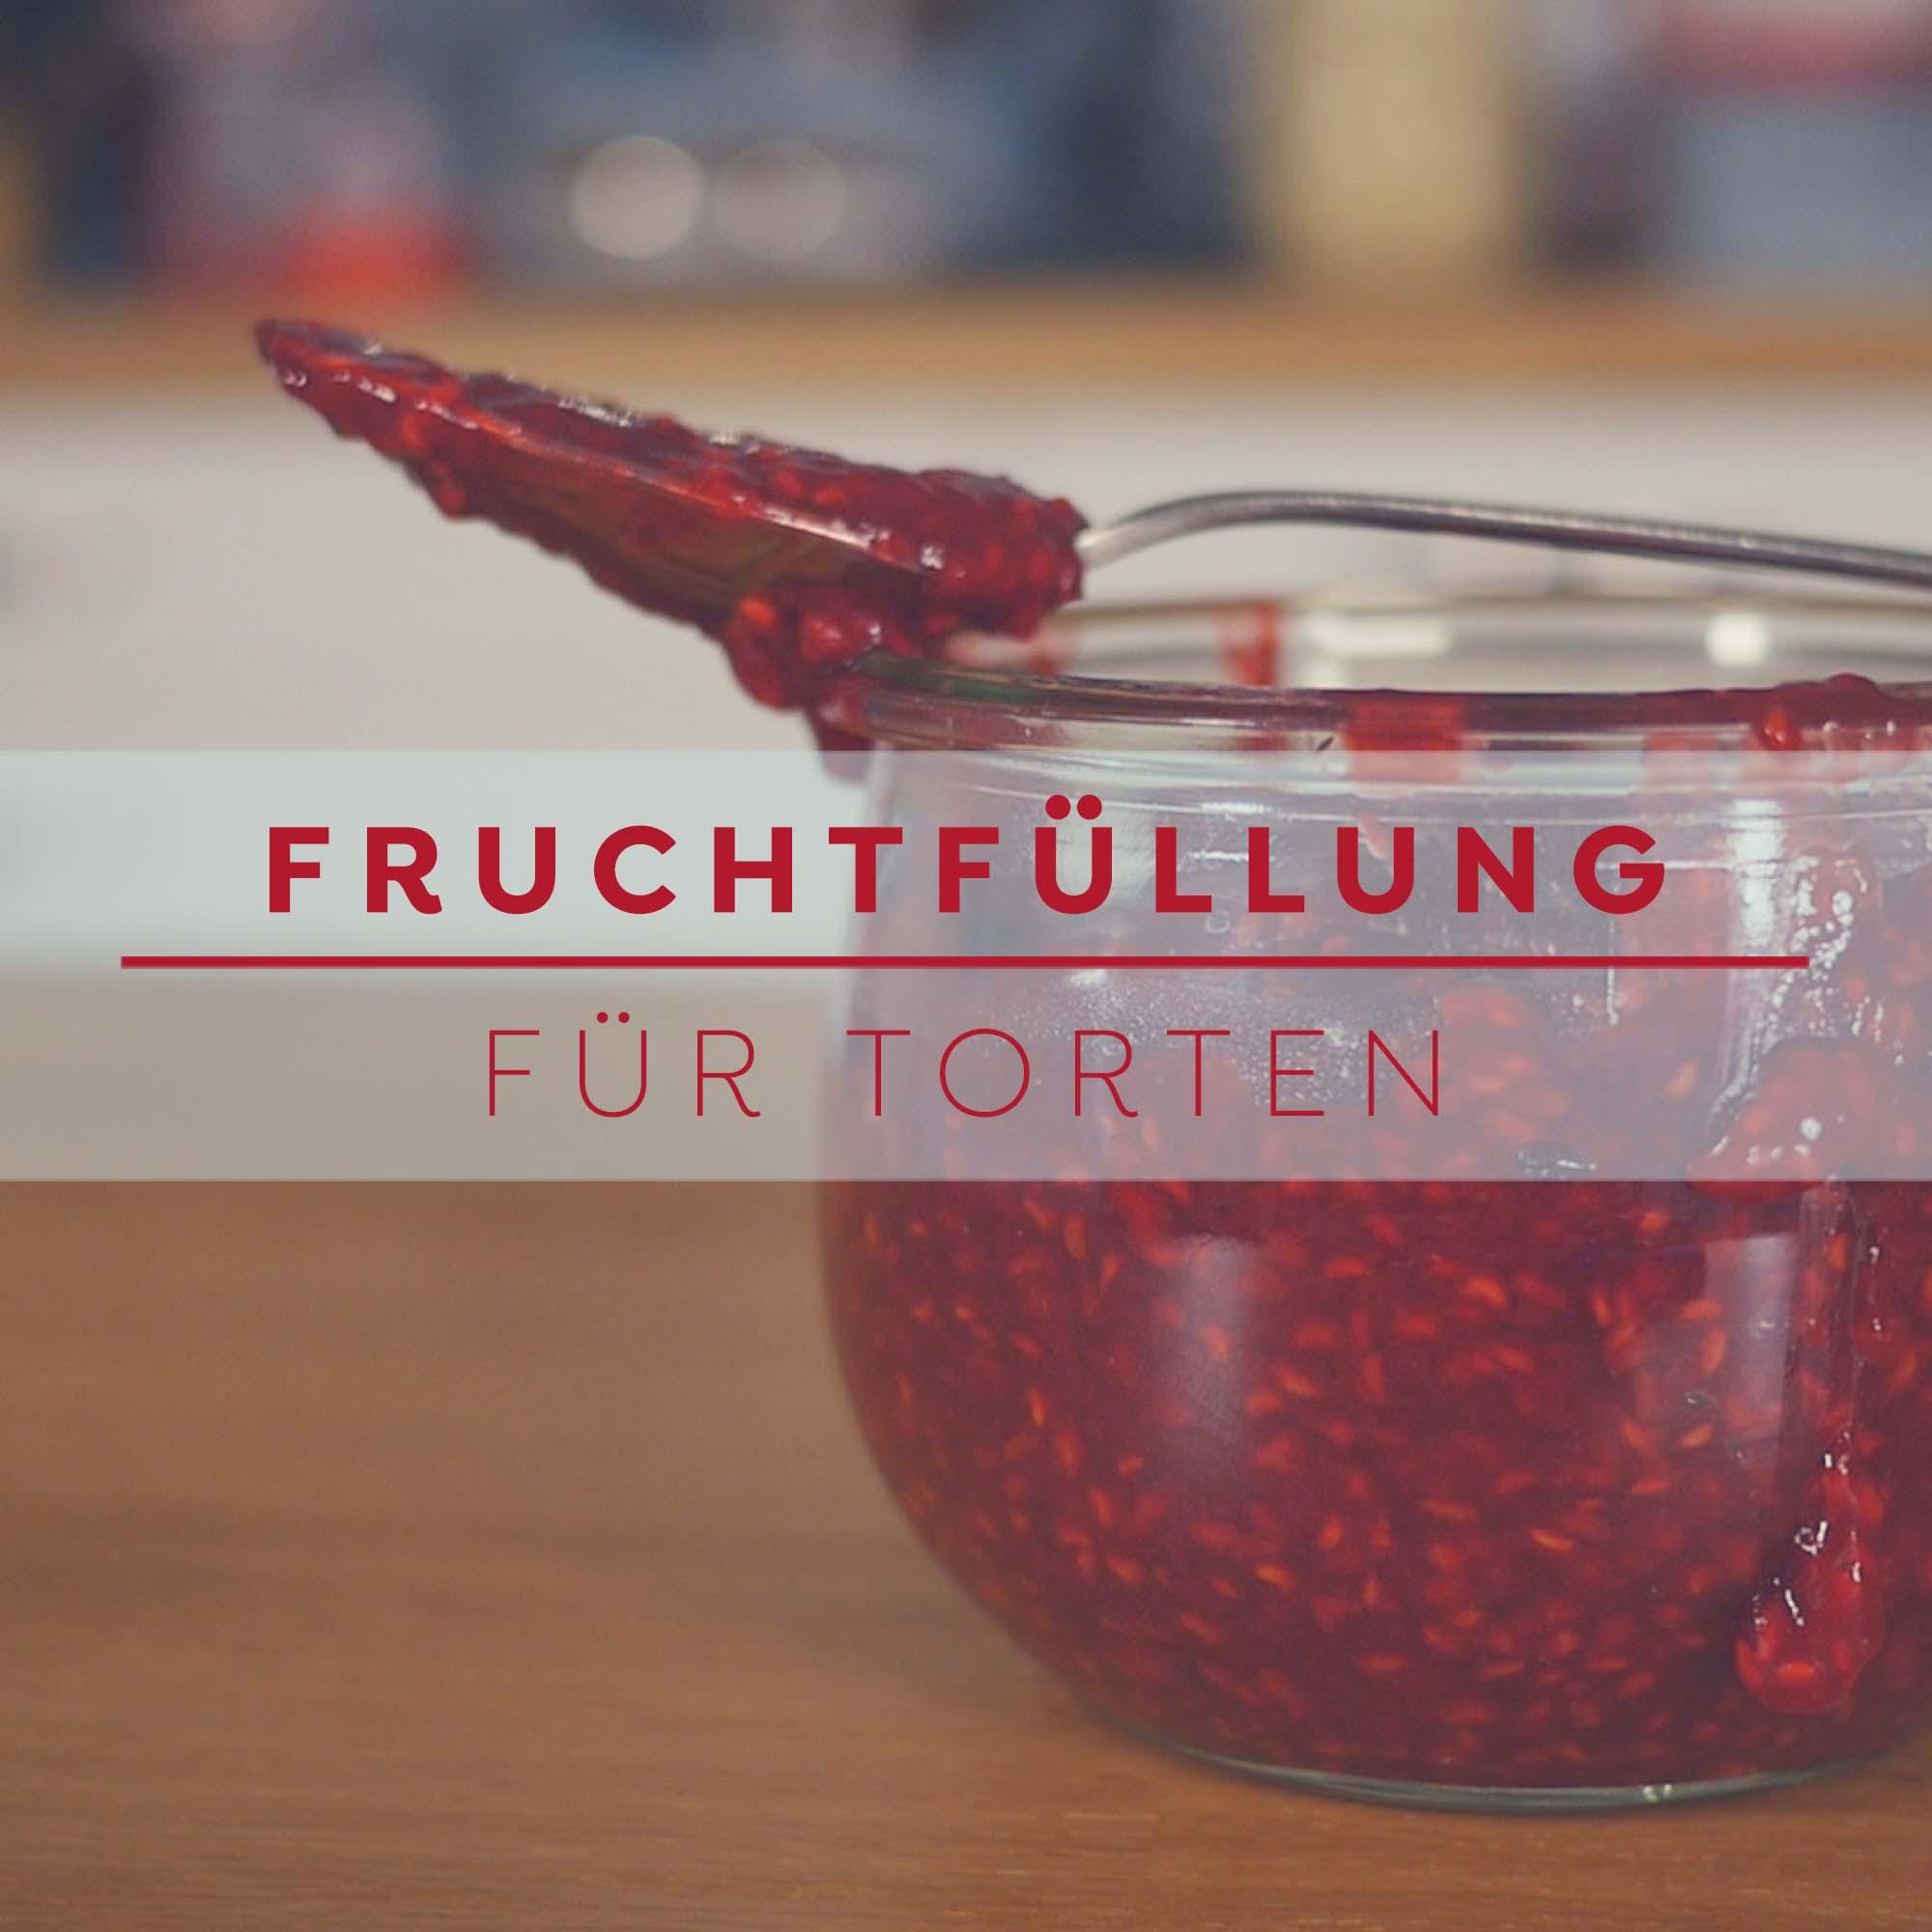 Fruchtfüllung für Torten - gekochte Früchte - Bettys Sugar Dreams Basic Rezept